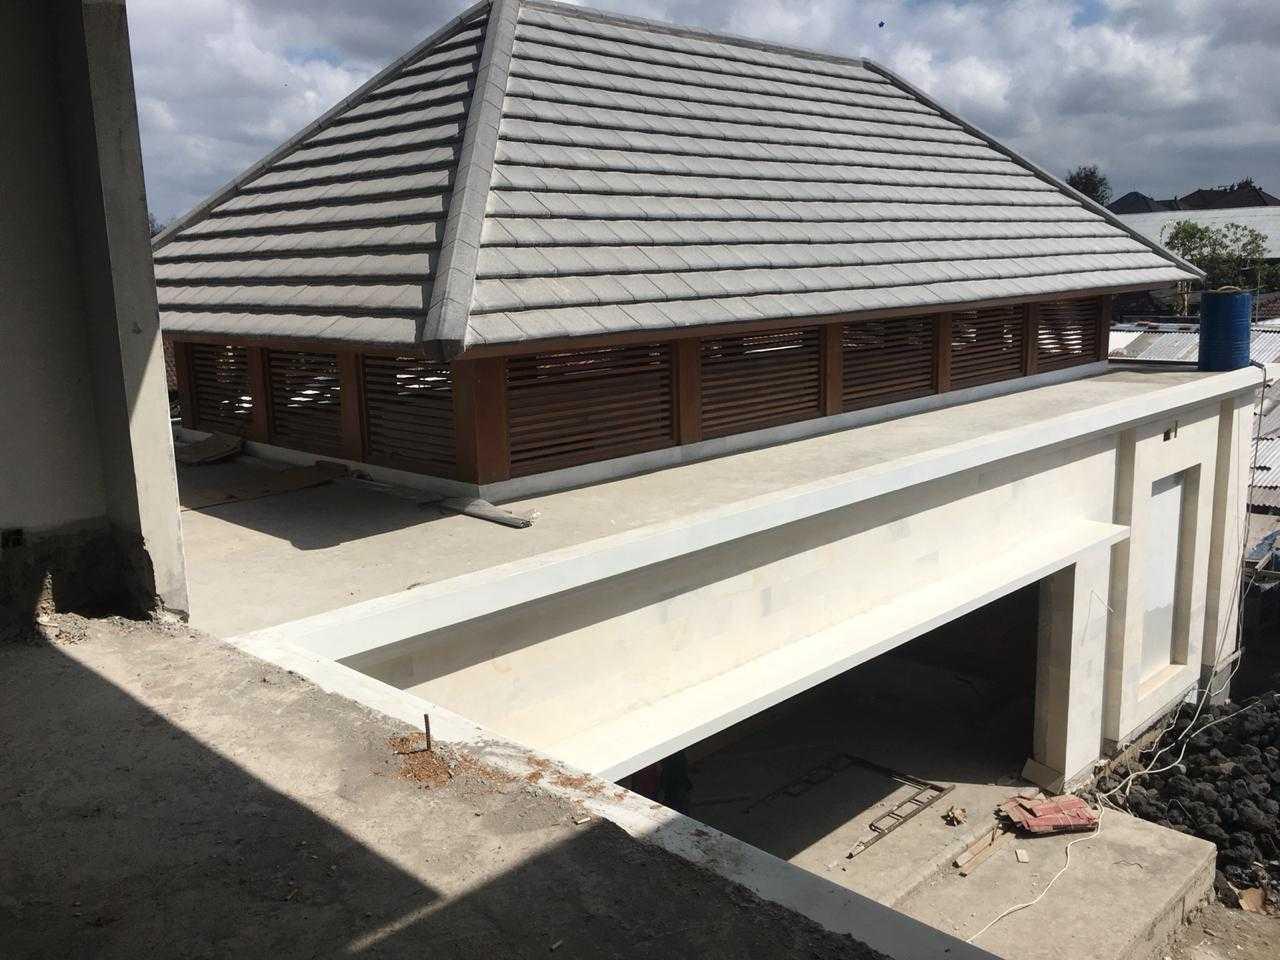 Emporio Architect In Progress Villa Bali Tropis 216  @ Denpasar Kota Denpasar, Bali, Indonesia Kota Denpasar, Bali, Indonesia Emporio-Architect-Progress-Villa-Bali-Tropis-216-Denpasar  75657